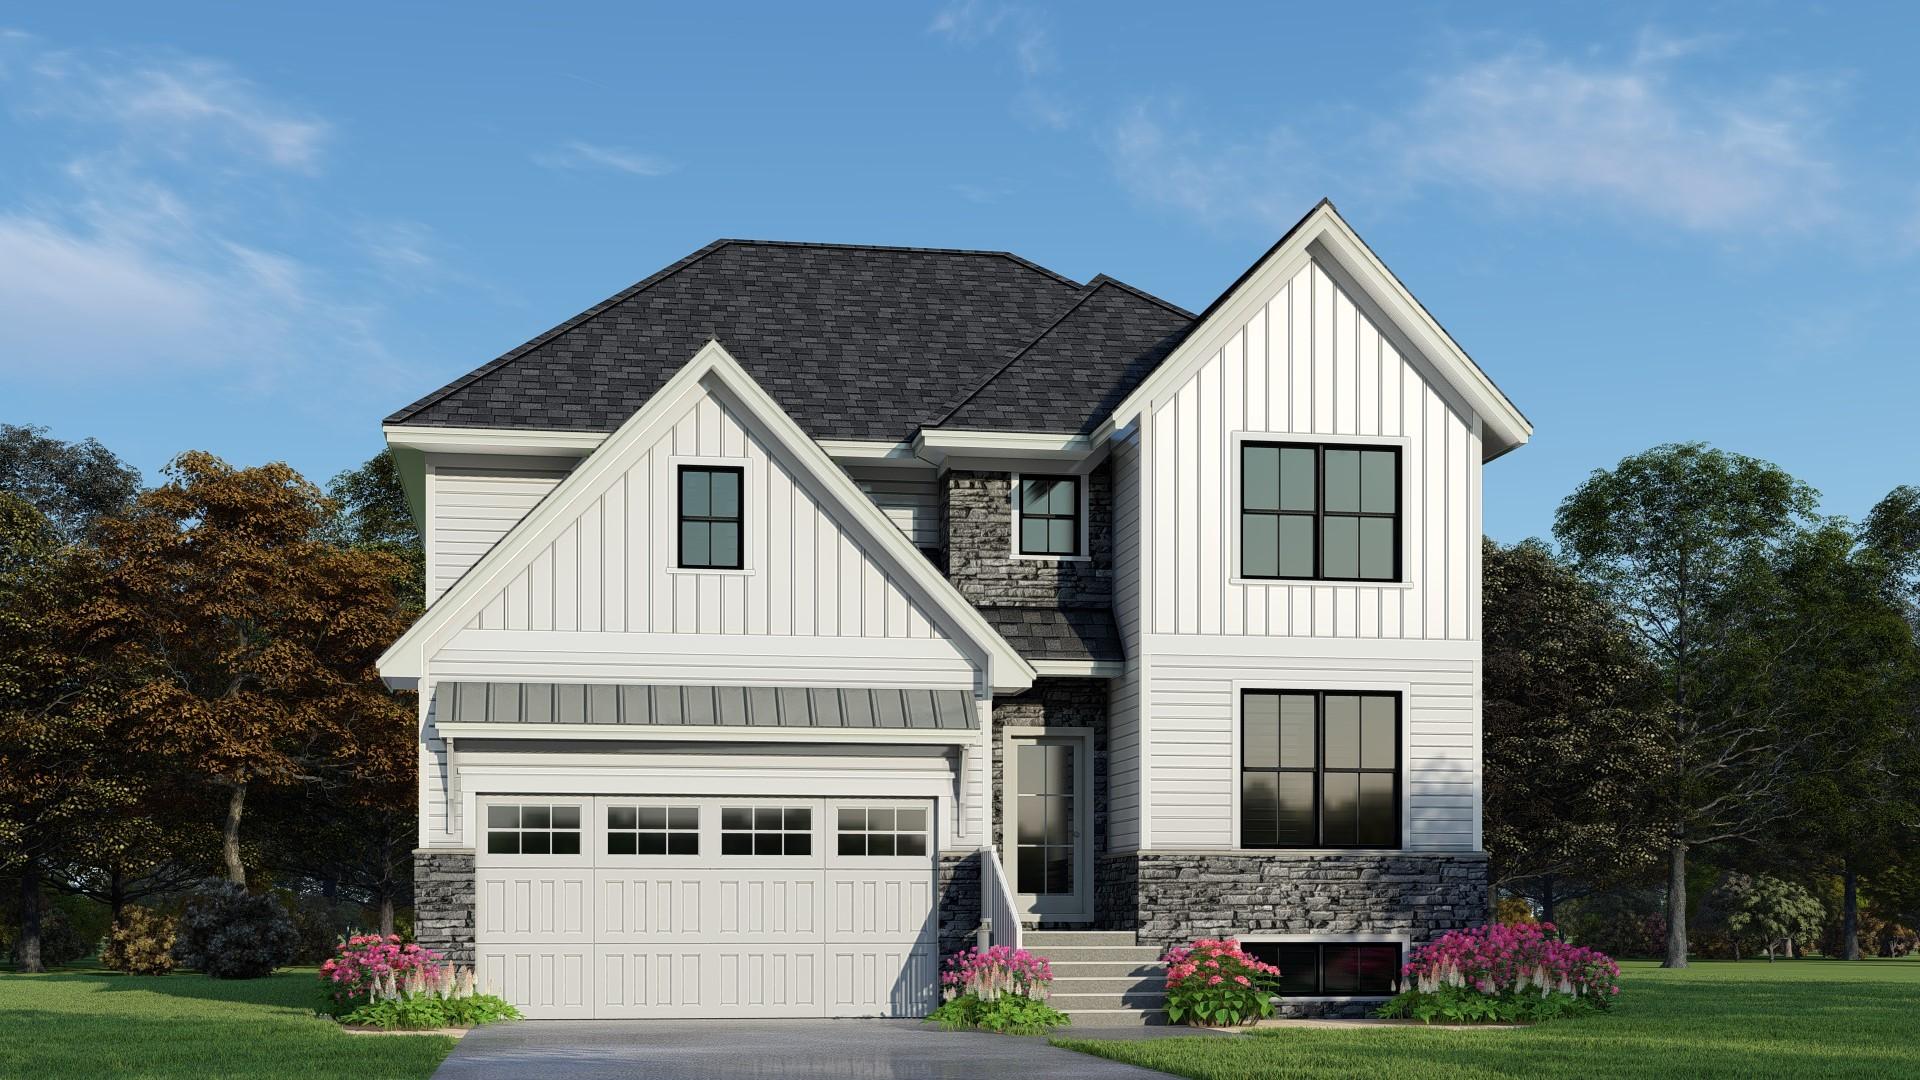 5321 Lawn Avenue, Western Springs, IL 60558